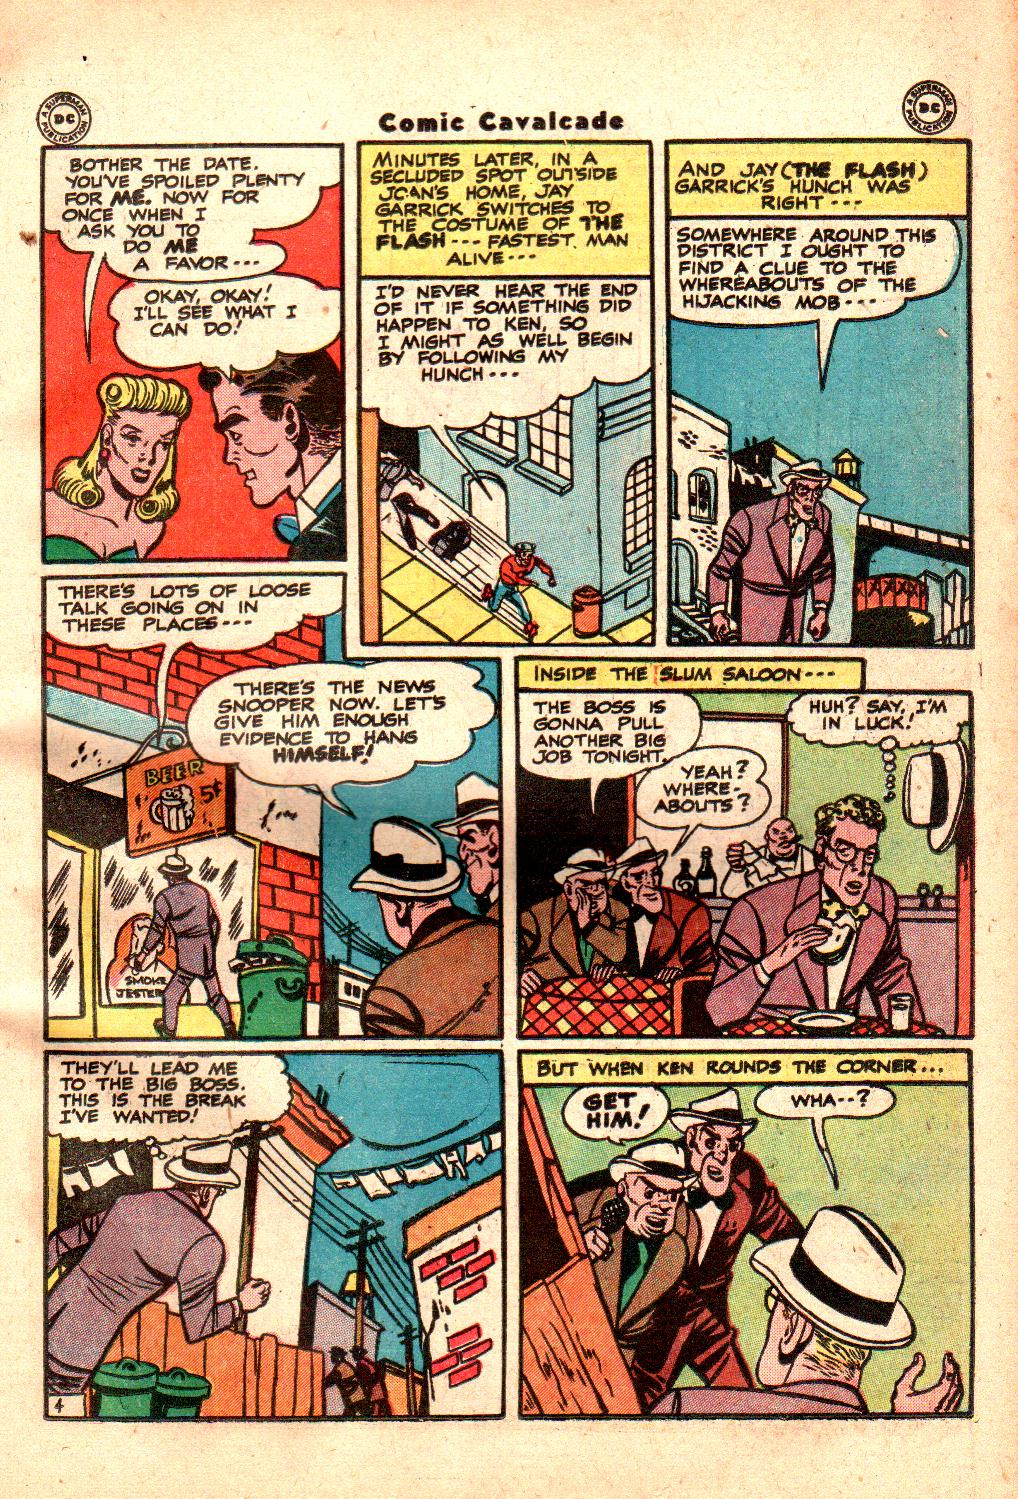 Comic Cavalcade issue 21 - Page 33